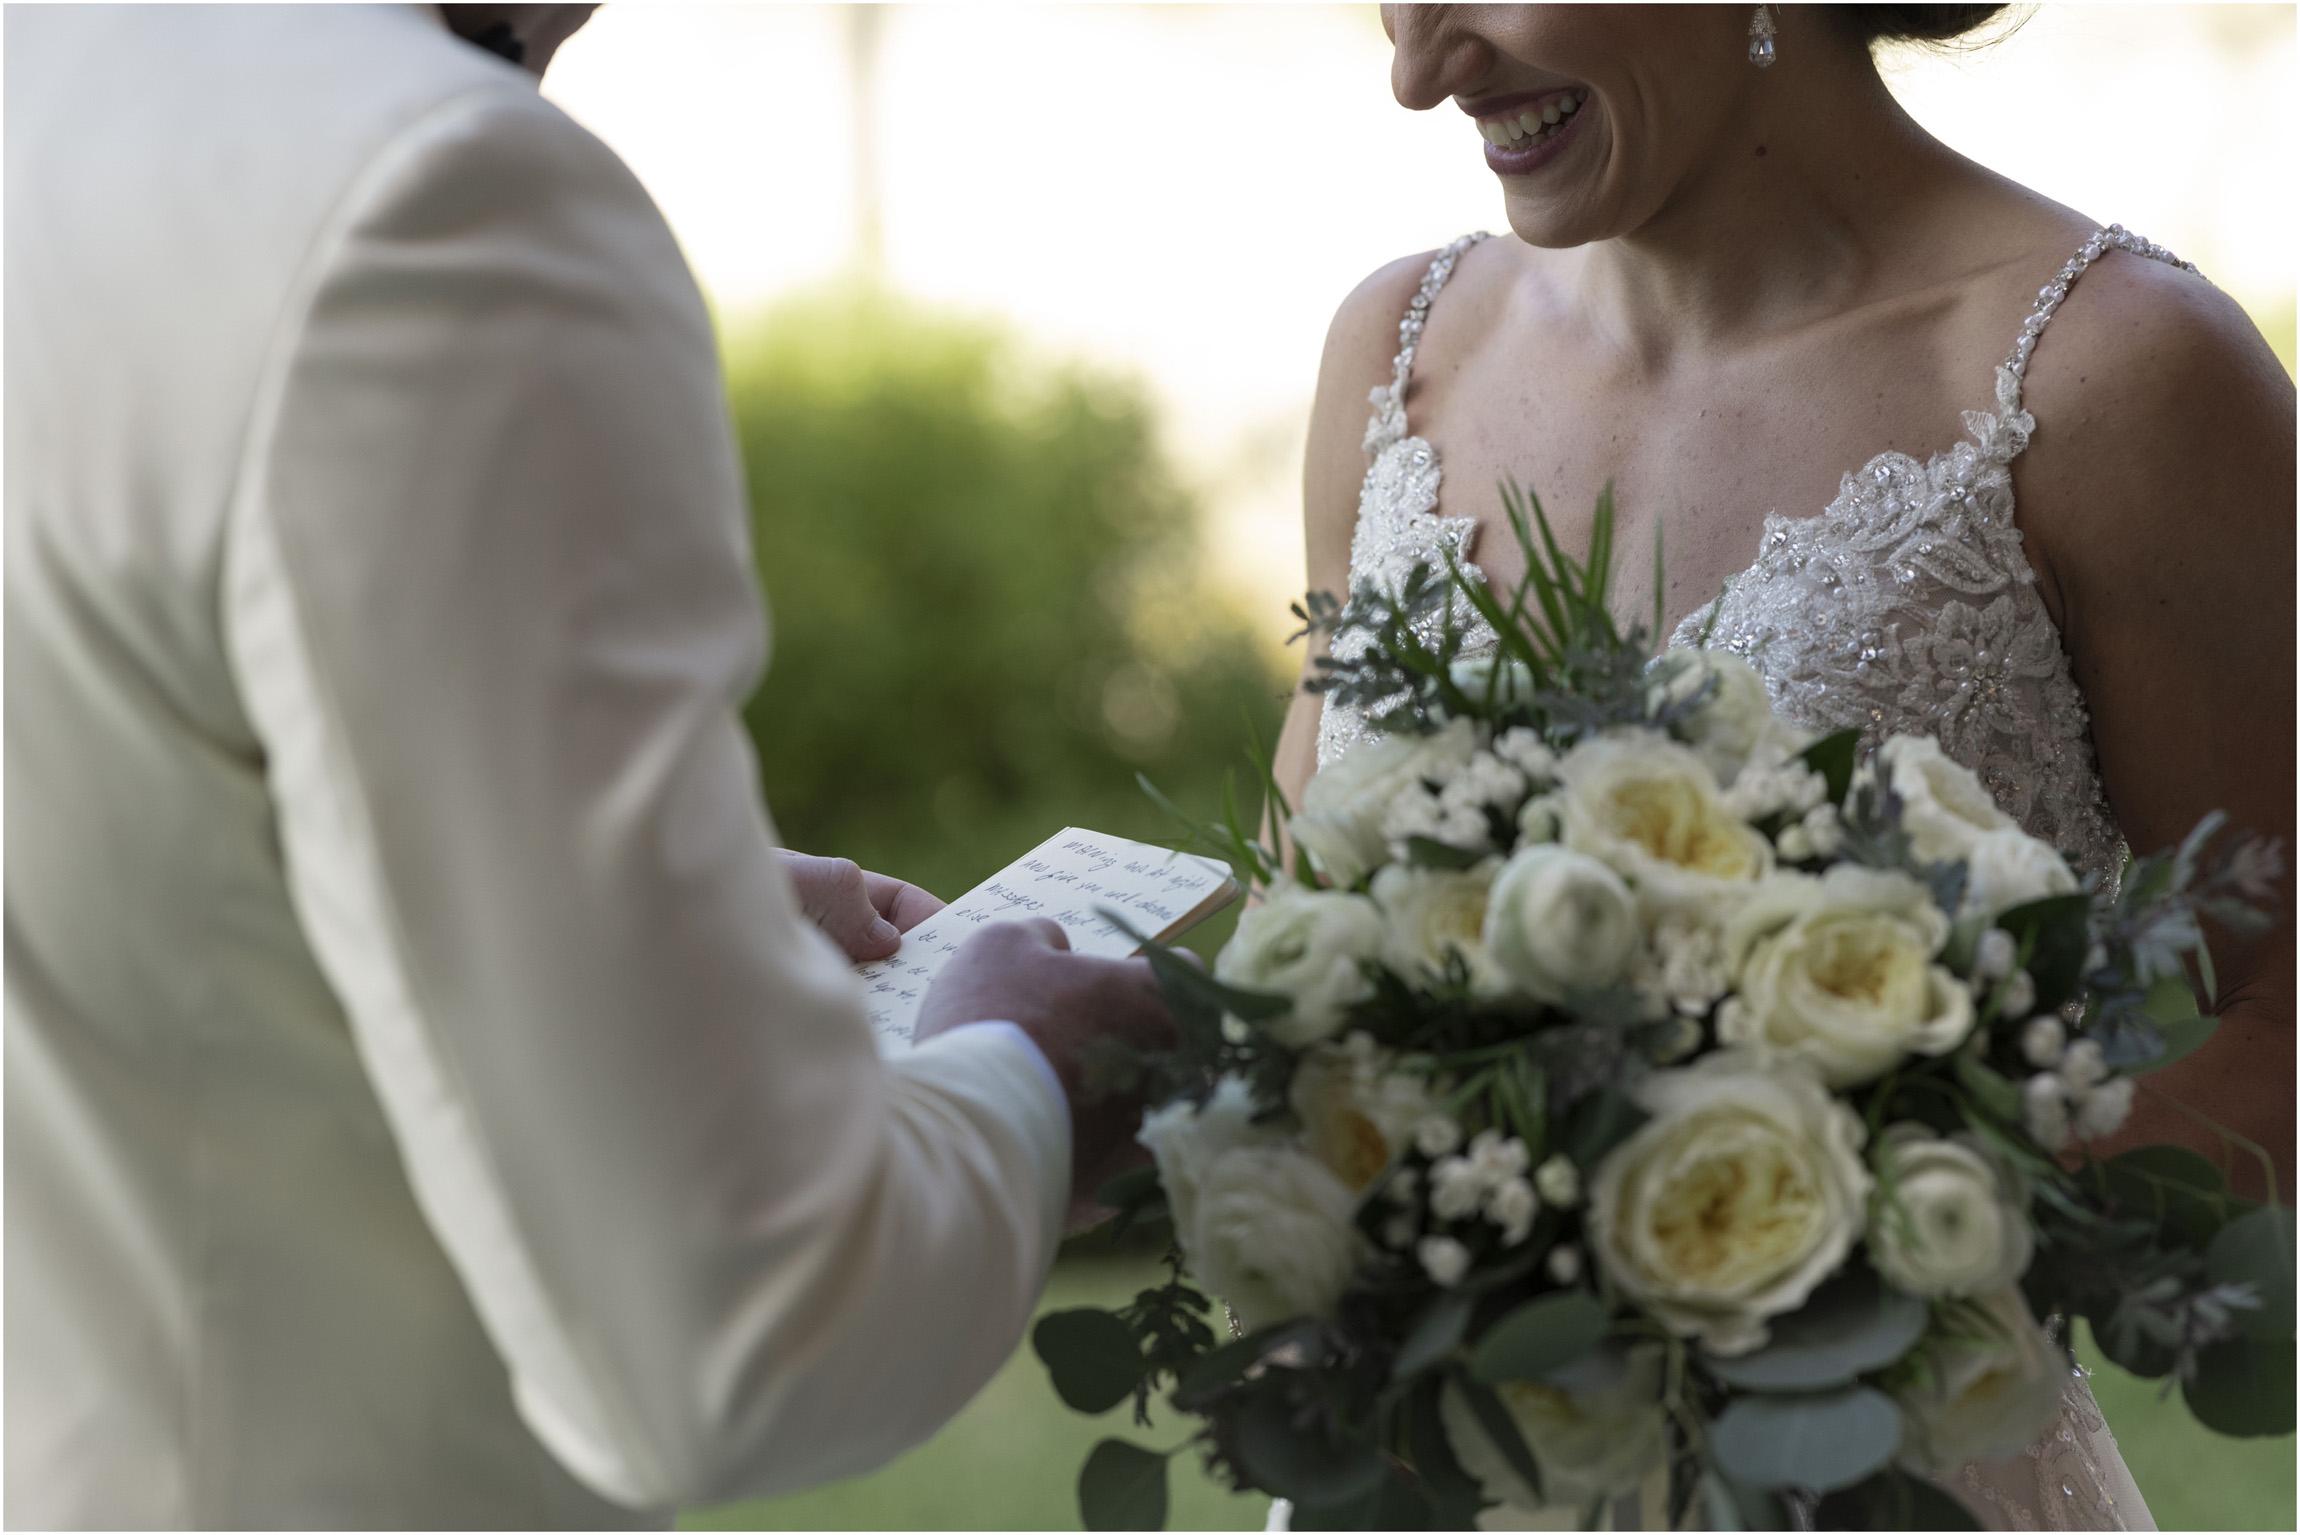 ©Fiander+Foto_Bermuda+Wedding+Photographer_The+Reefs_Taylor_Tedd_062.jpg